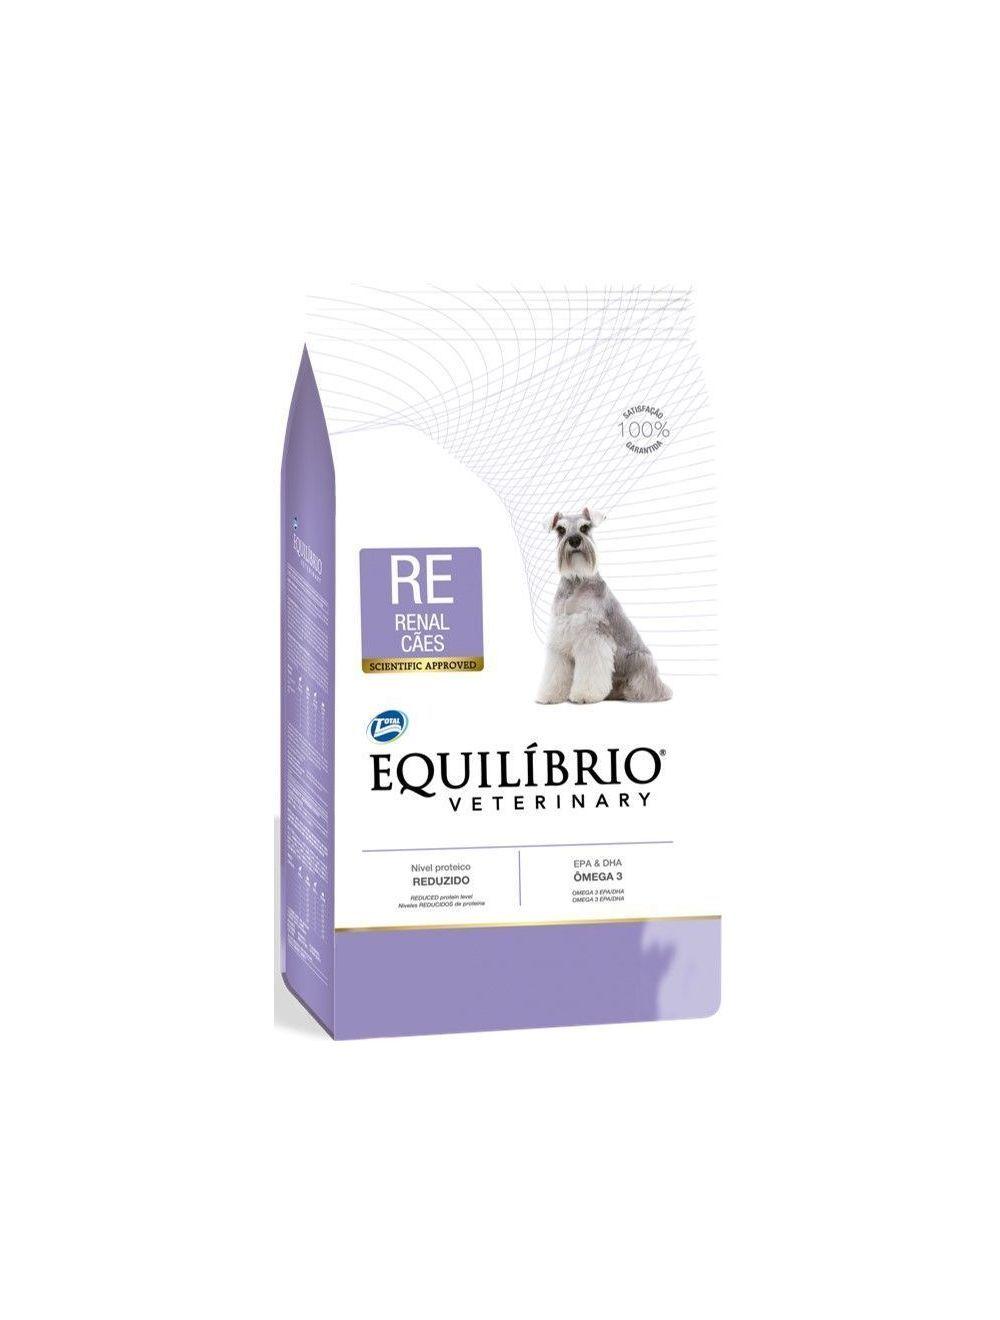 Equilibrio Perro Veterinary Renal x 7.5Kg